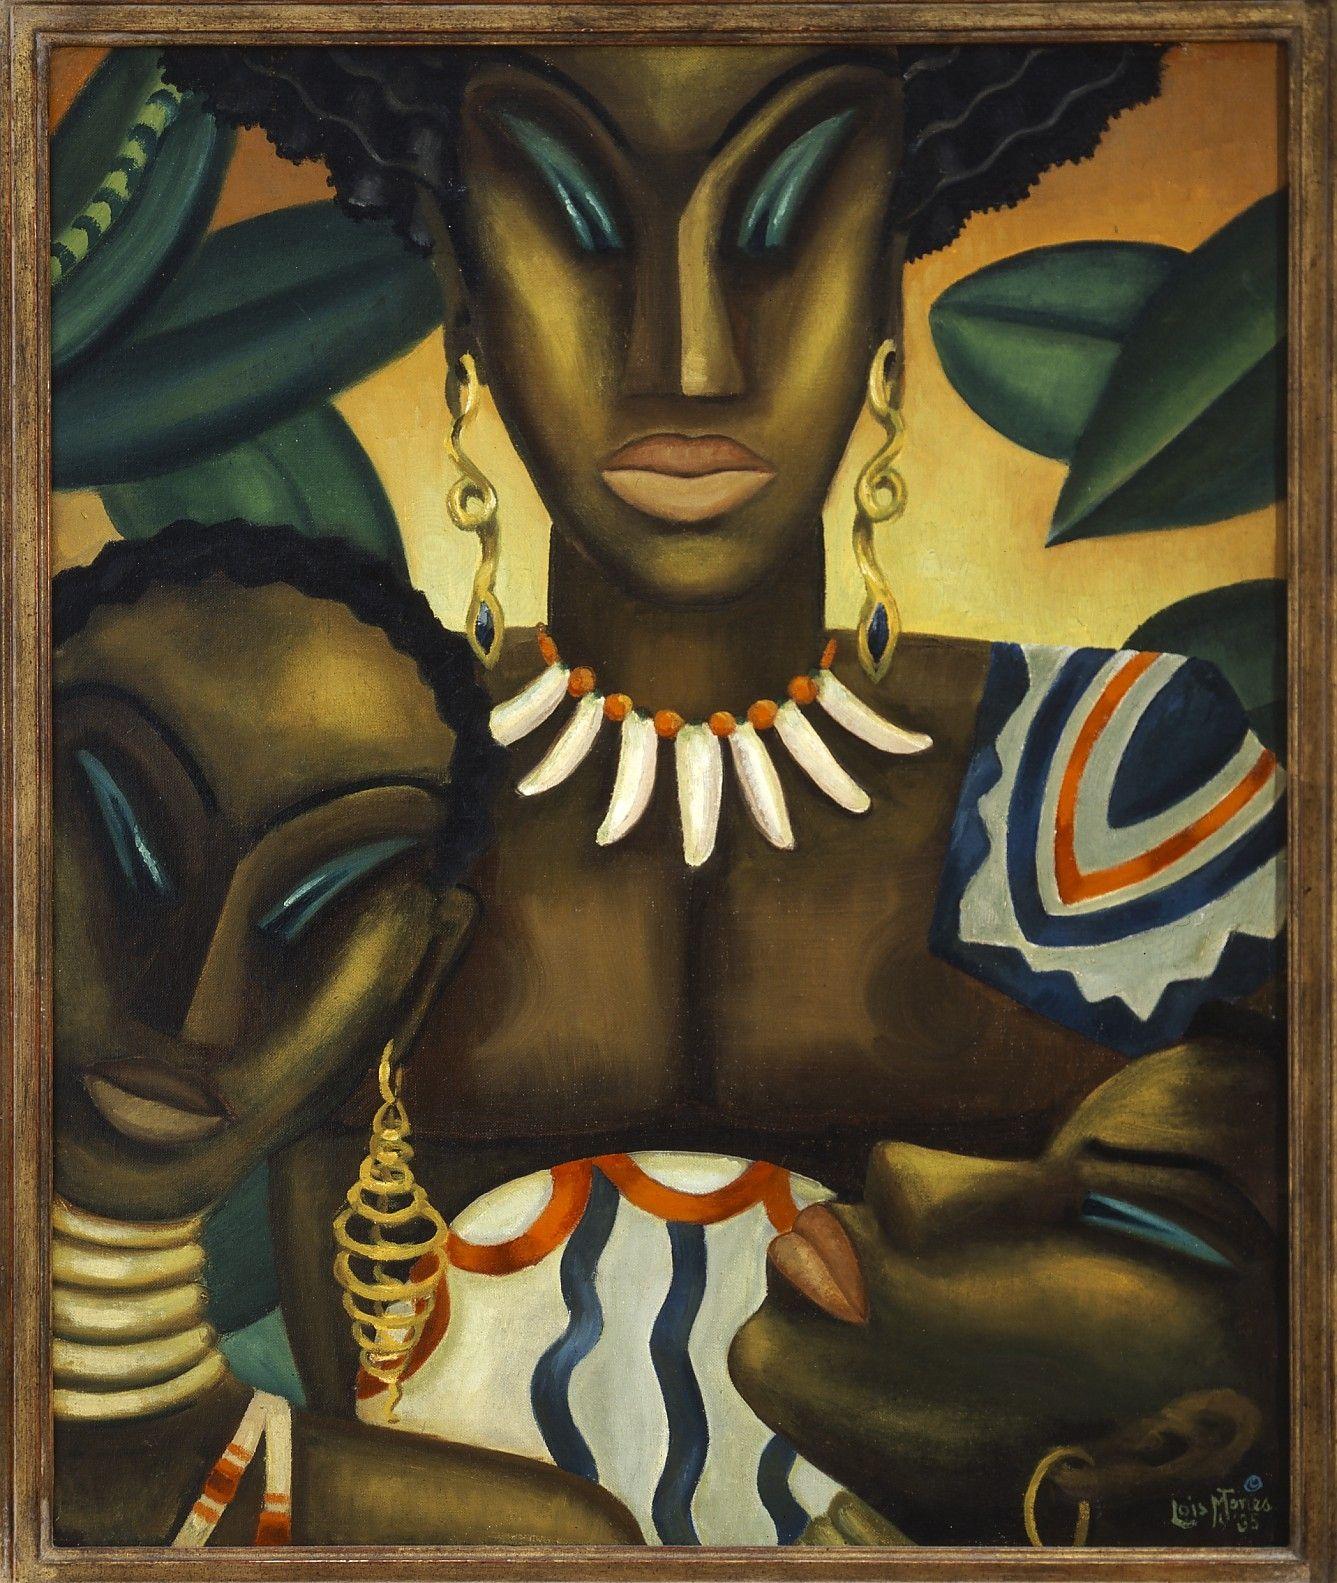 Africa by Lois Mailou Jones 1935 Oil on canvas Lois Mailou Jones